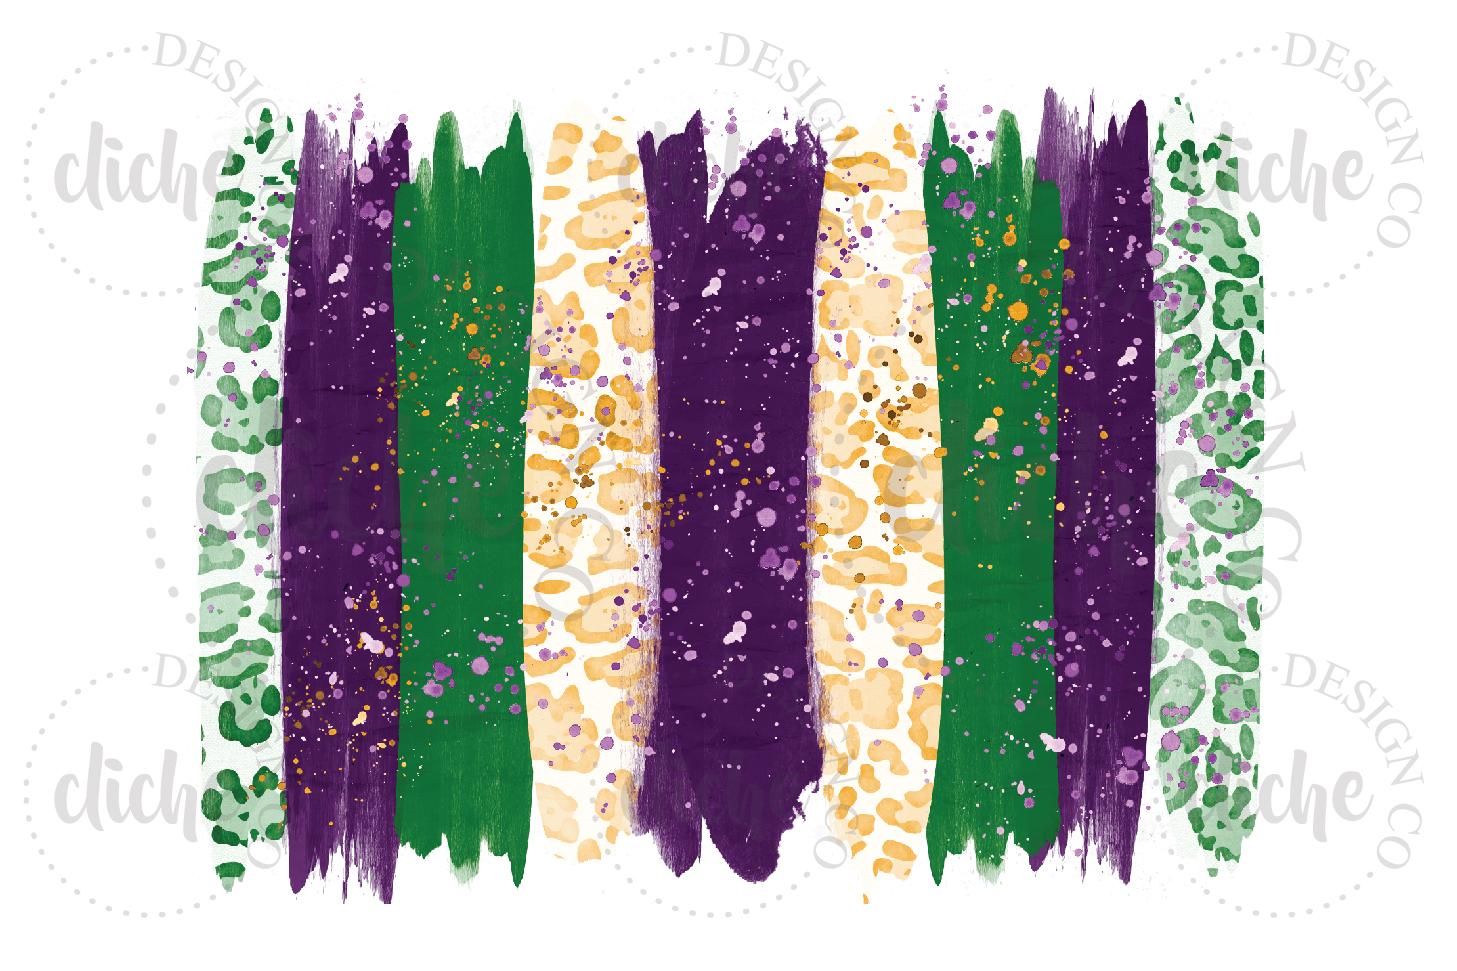 Mardi Gras Paint Stroke Sublimation Design Background example image 1